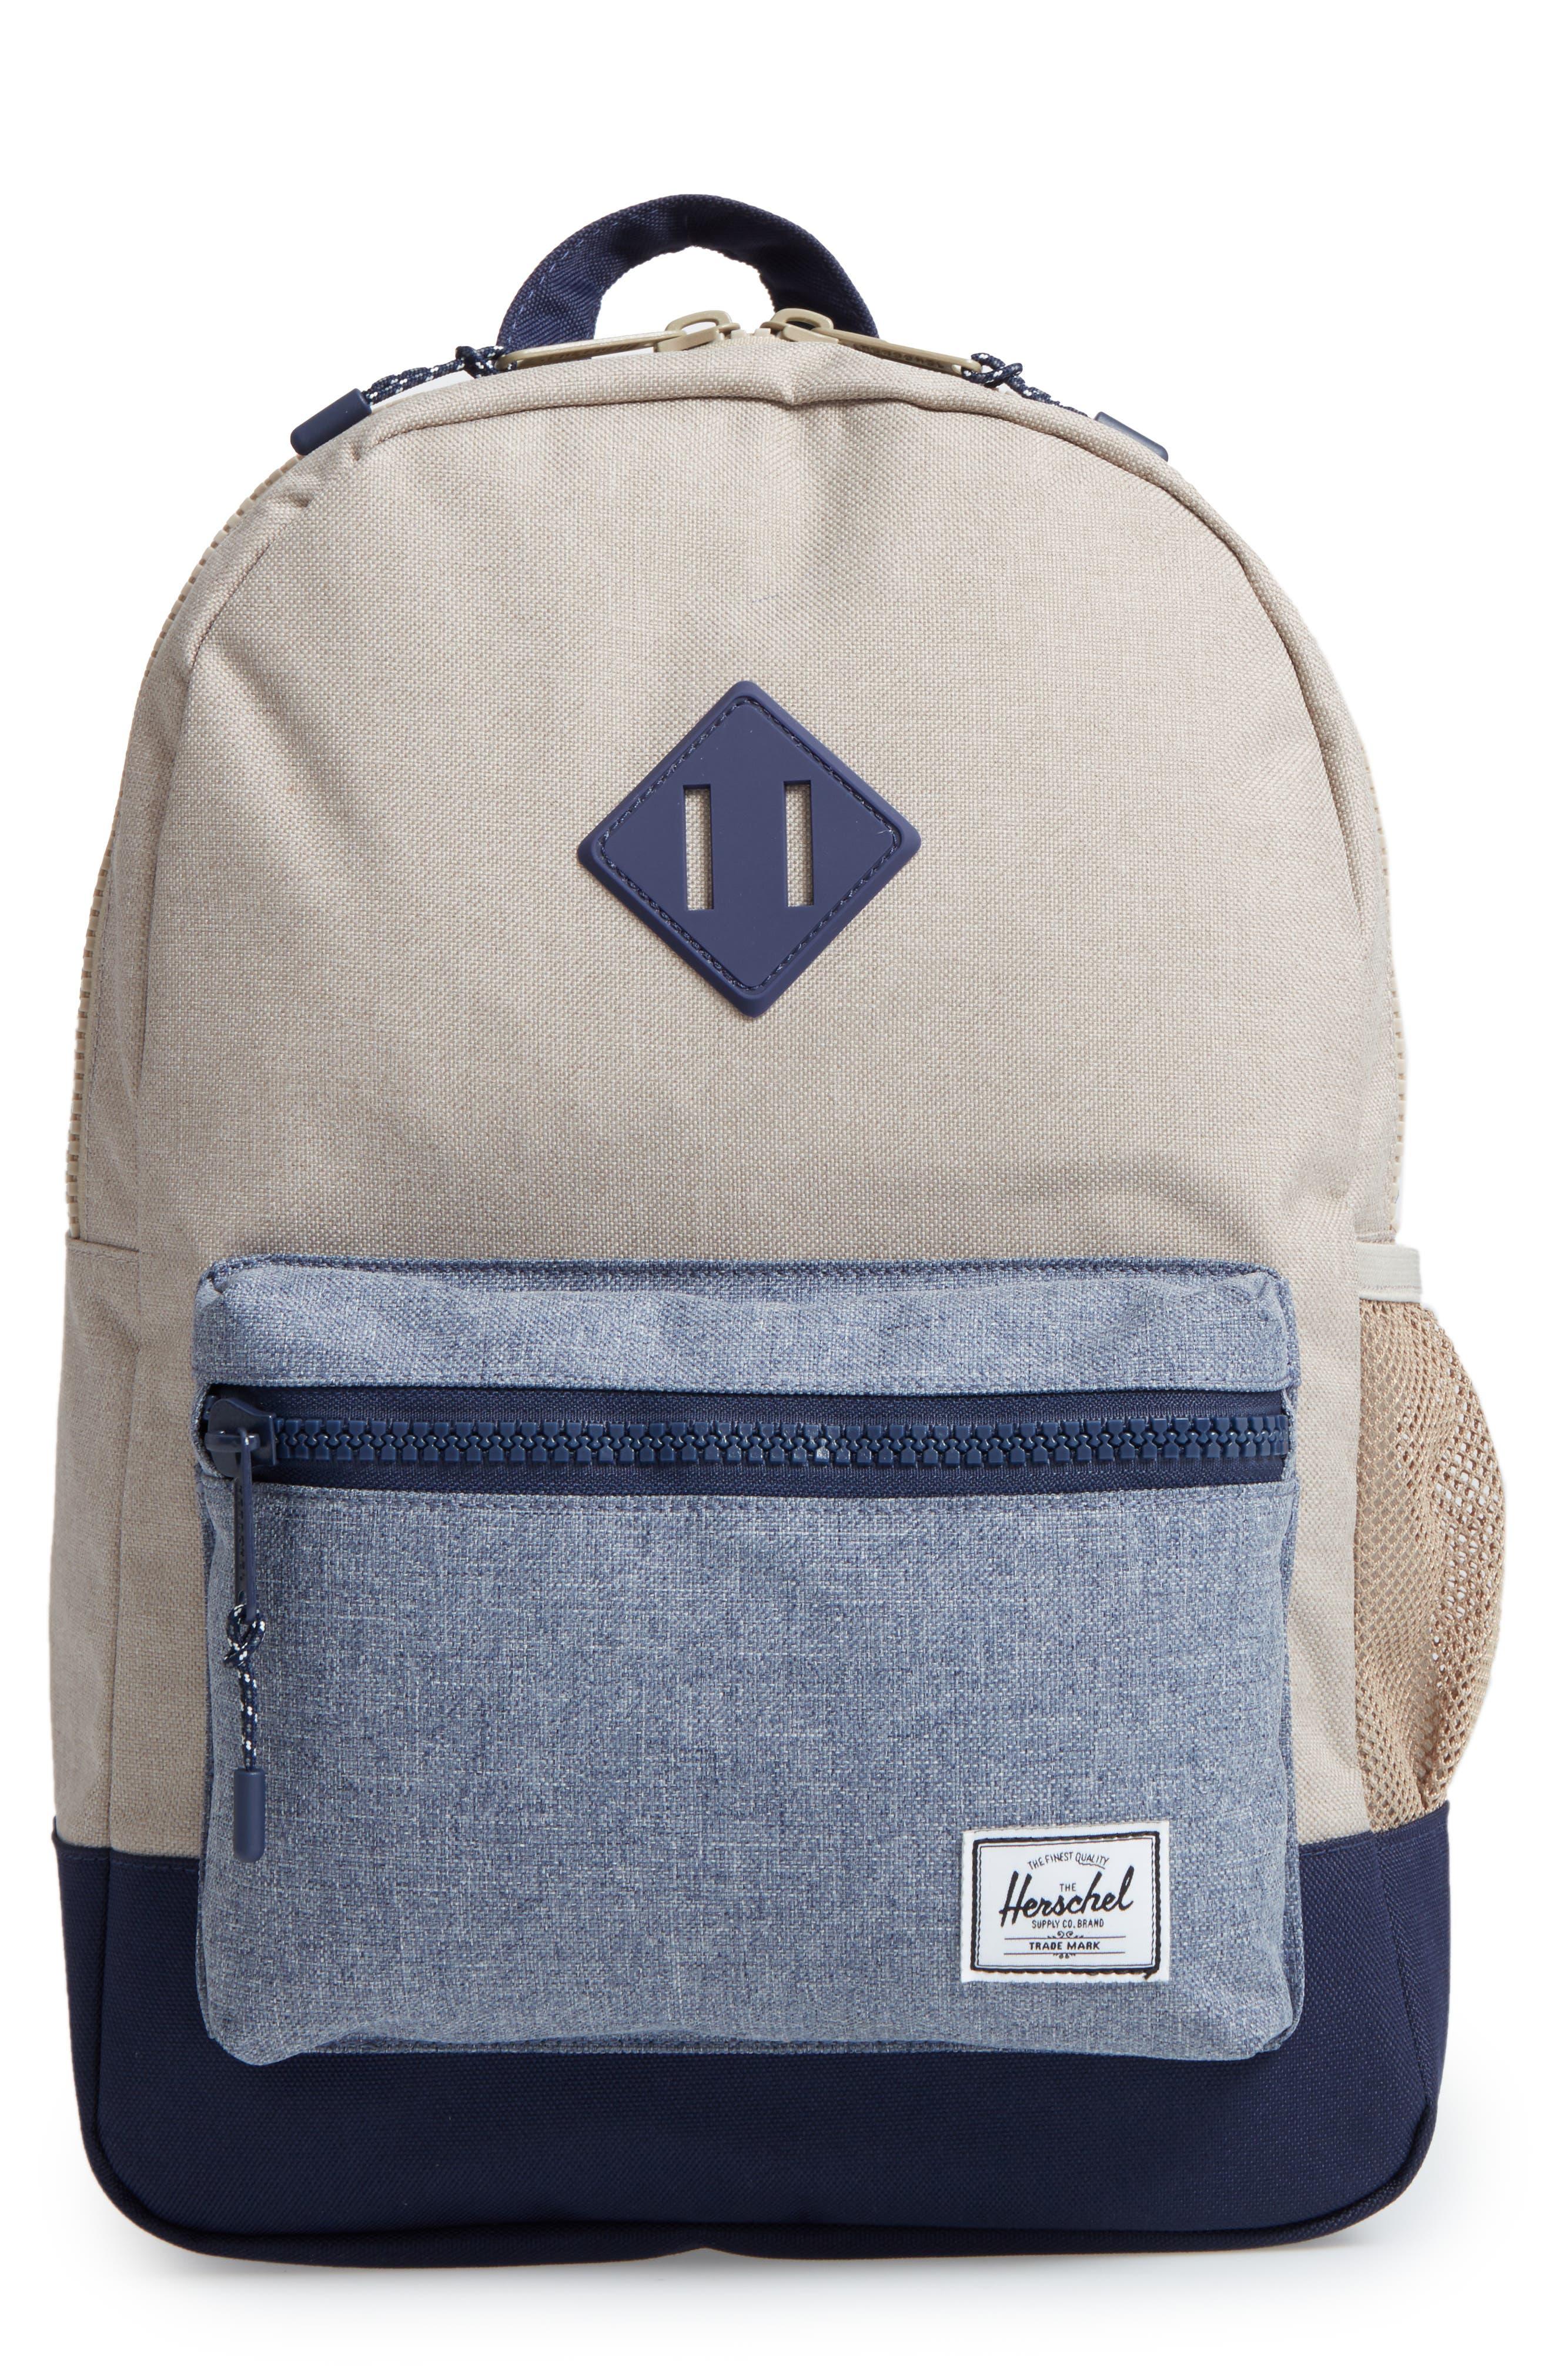 Main Image - Herschel Supply Co. Heritage Backpack (Kids)